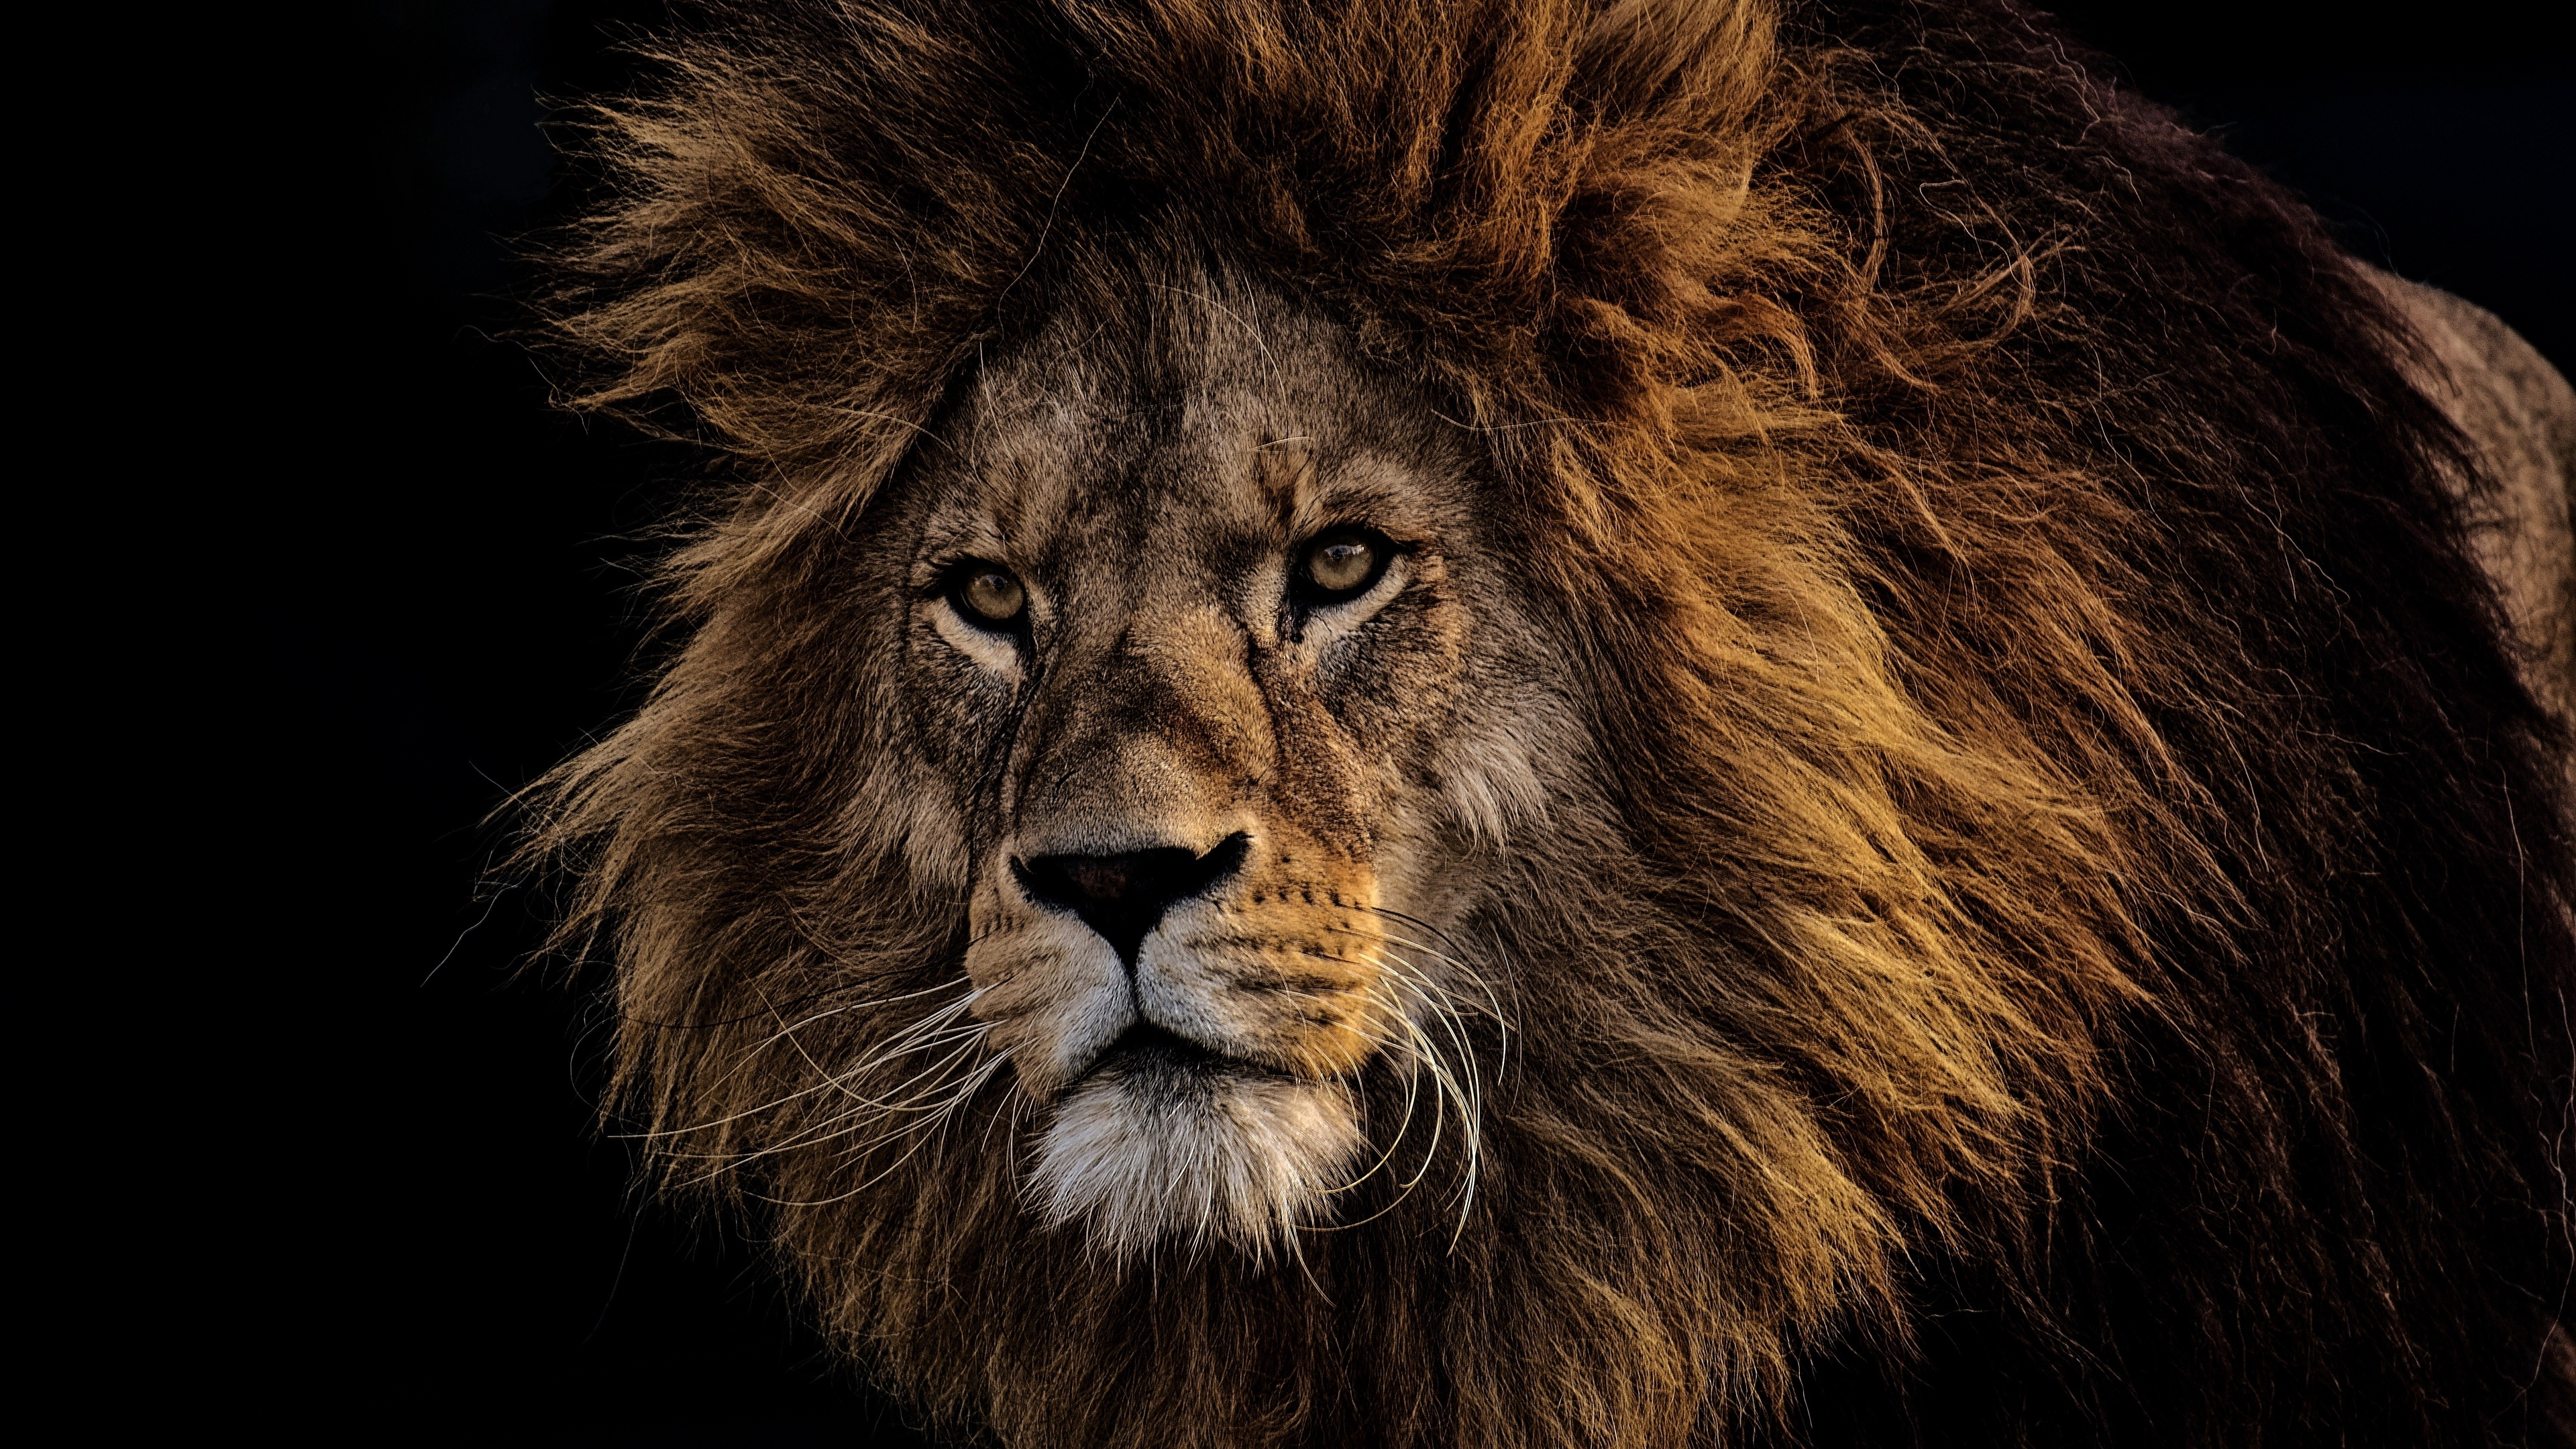 Male Lion 4k Ultra HD Wallpaper   Background Image ...